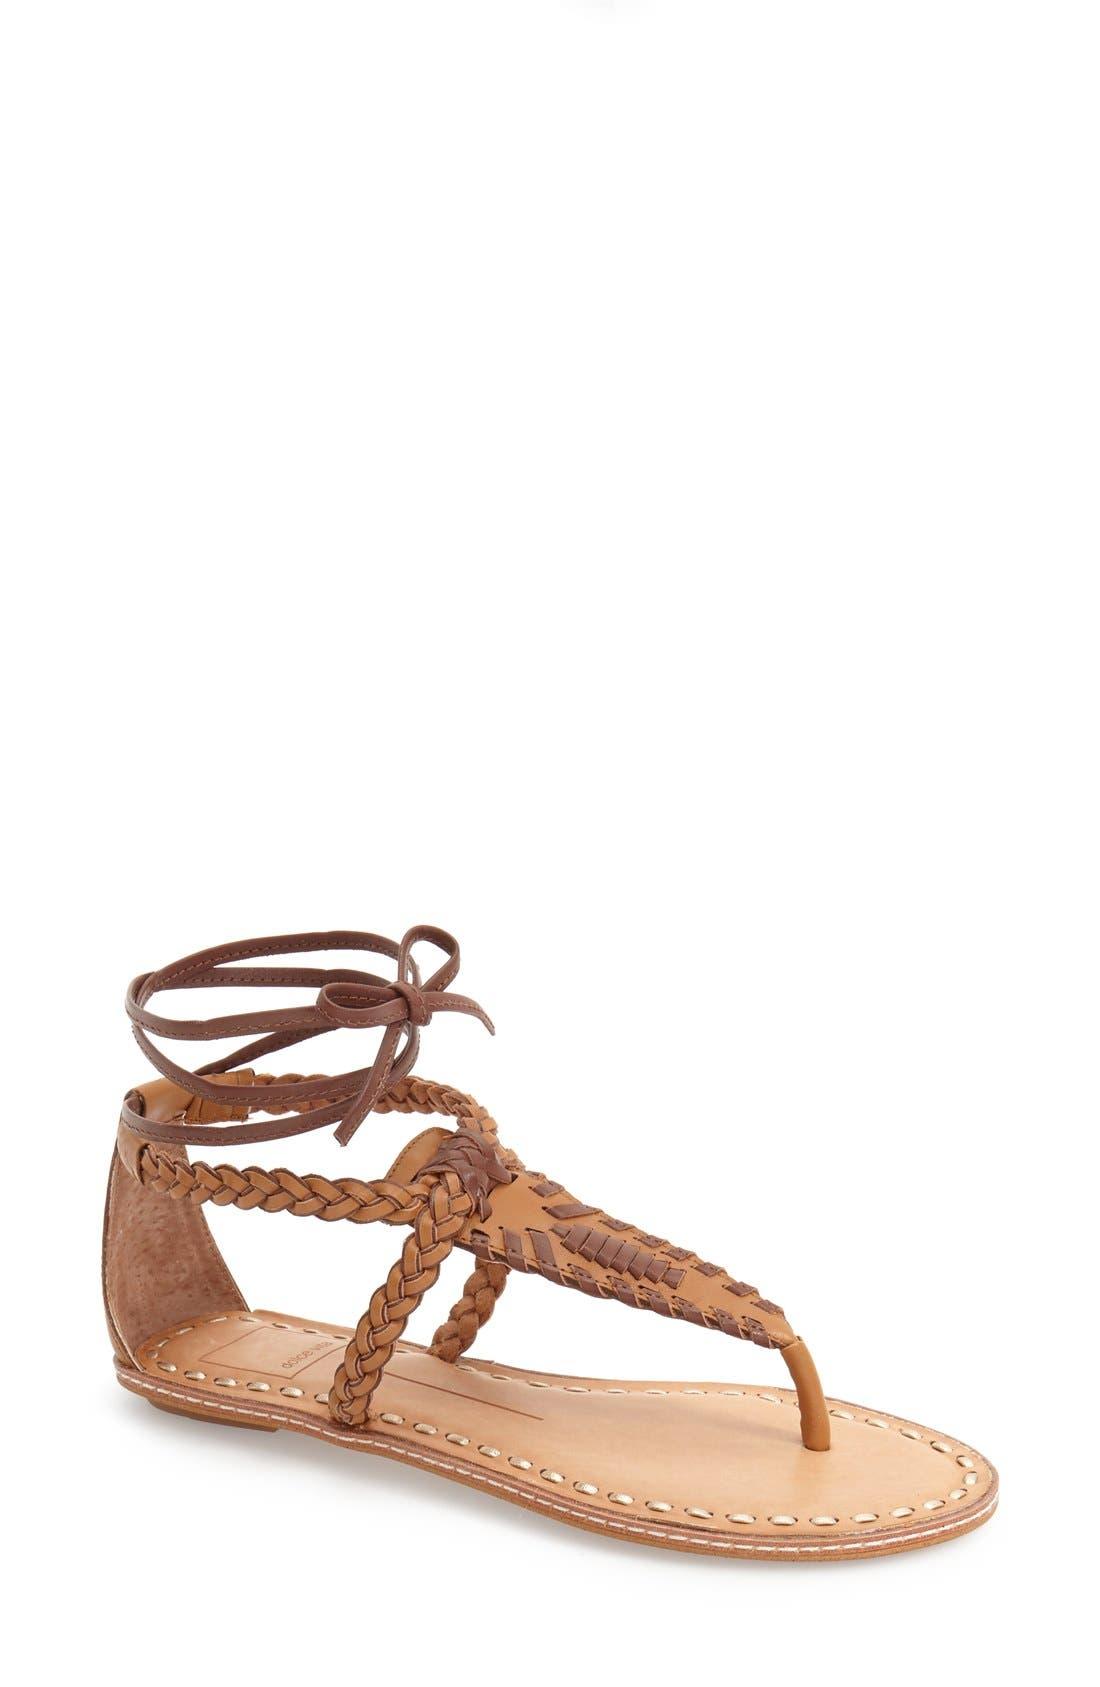 Main Image - Dolce Vita 'Keoni' Flat Sandal (Women)